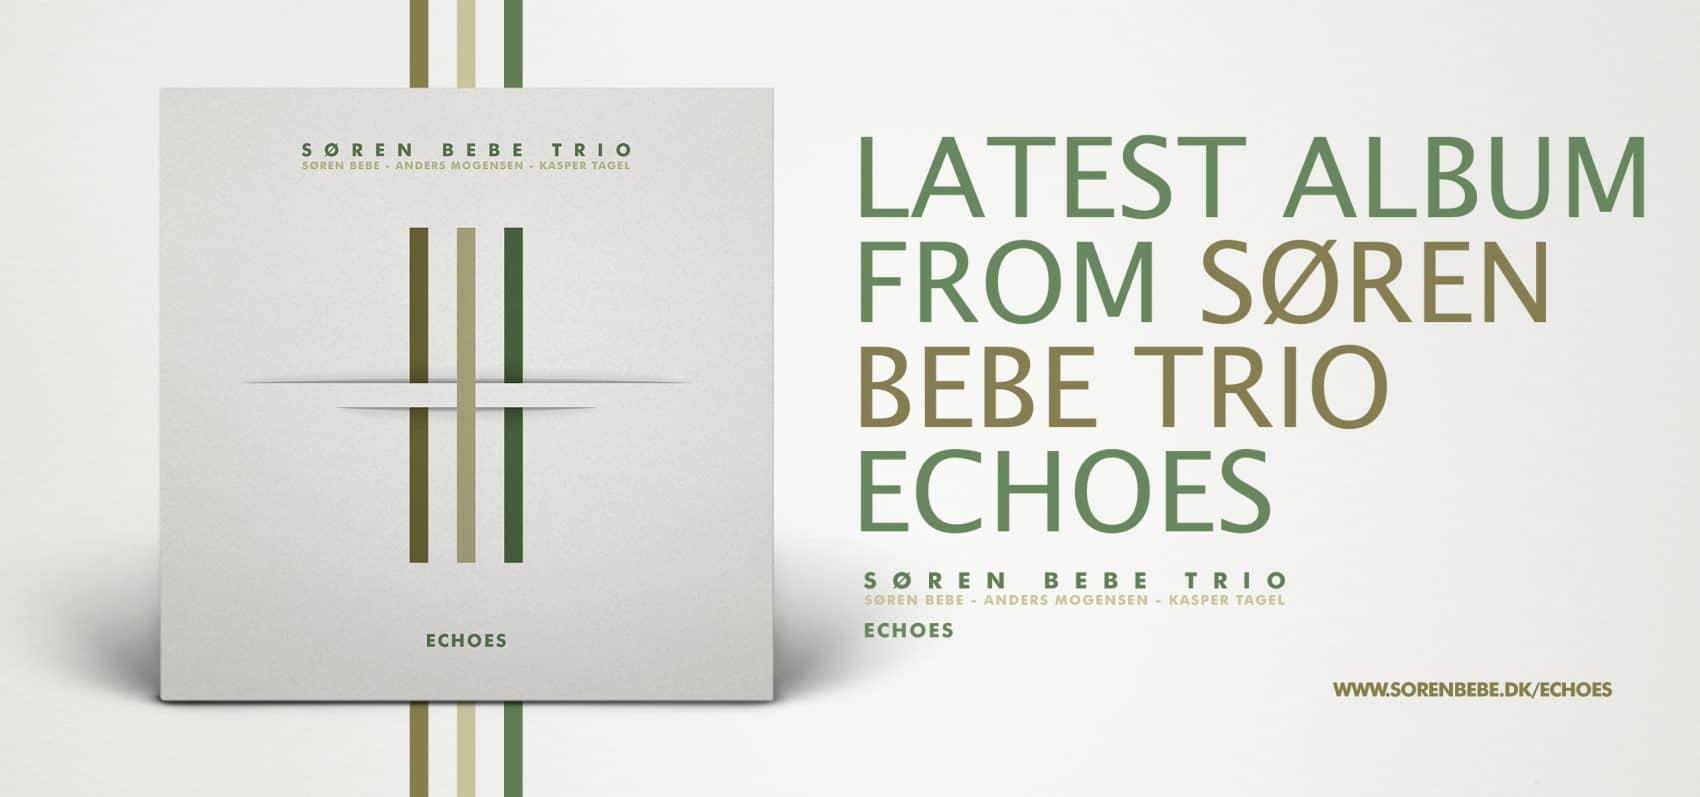 Soren Bebe Trio Echoes album